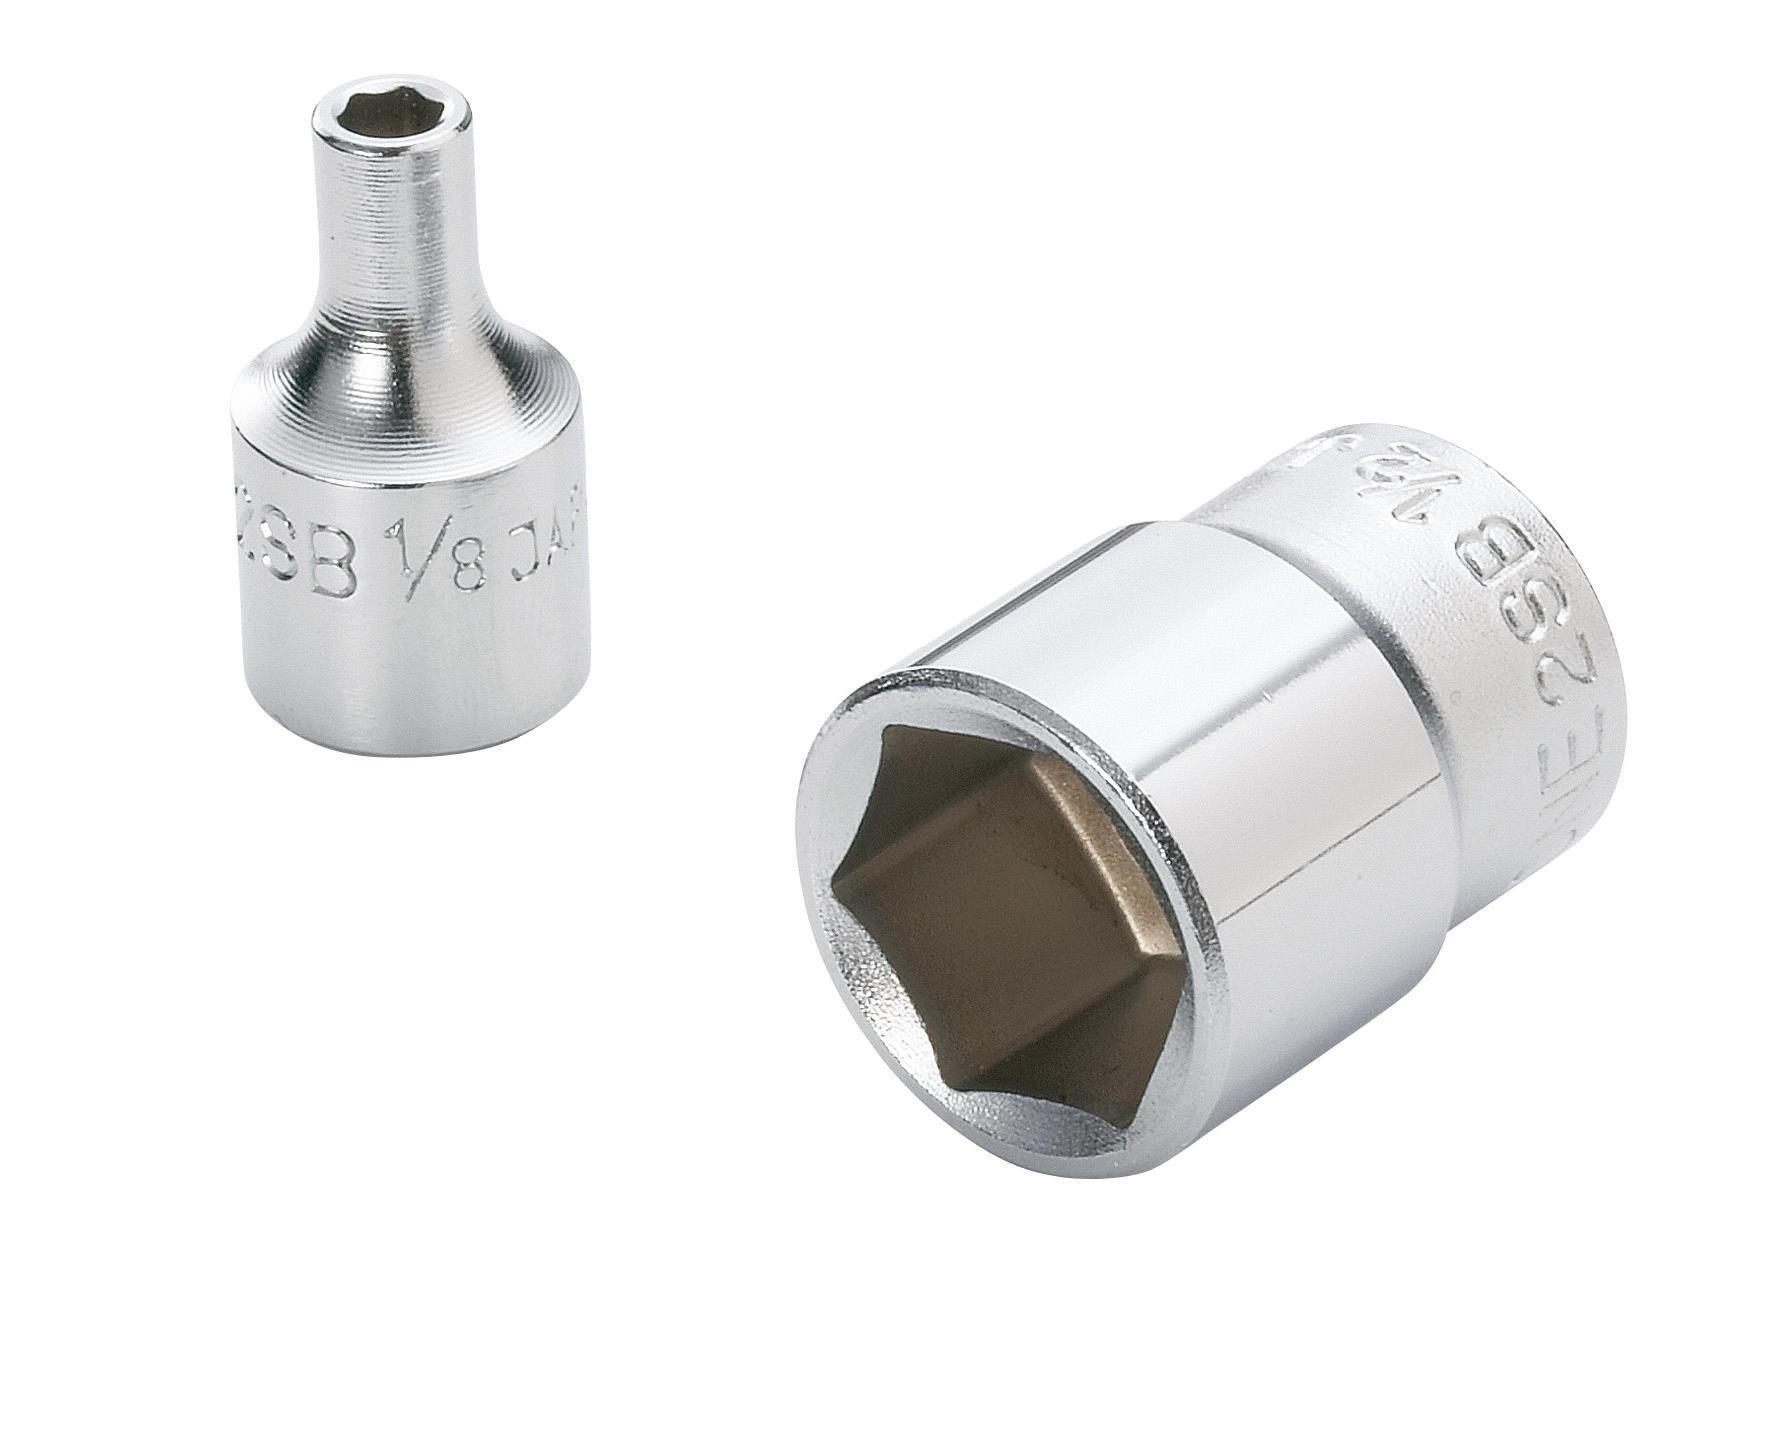 Đầu khẩu TONE 2SB-04